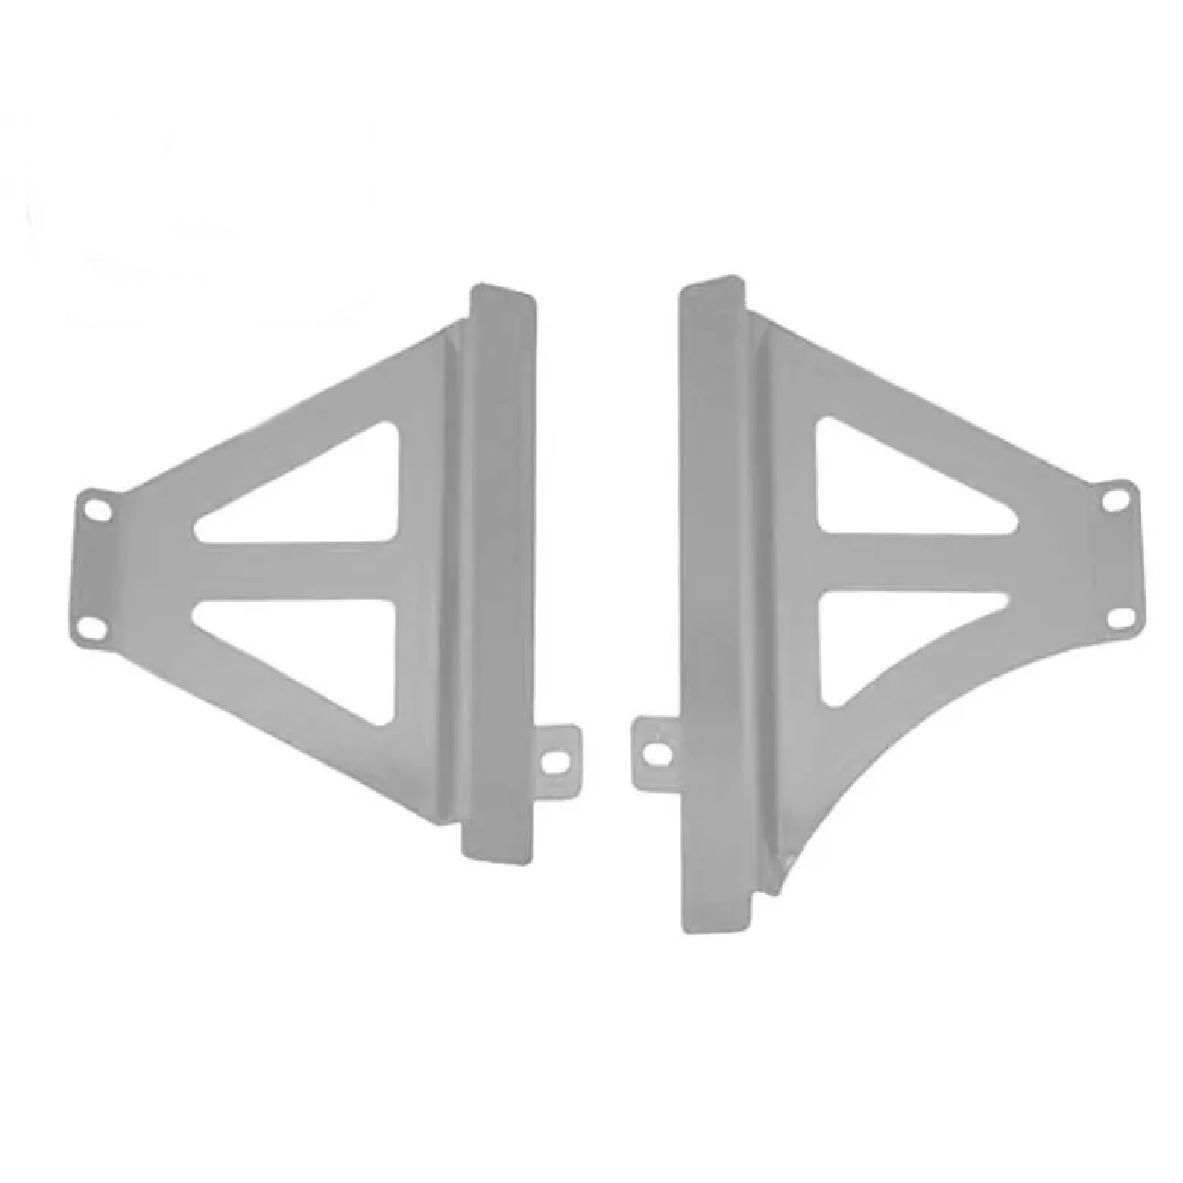 Protetor Radiador Start Triangular Mx Crf 250r 2014 Crf 250r 2015